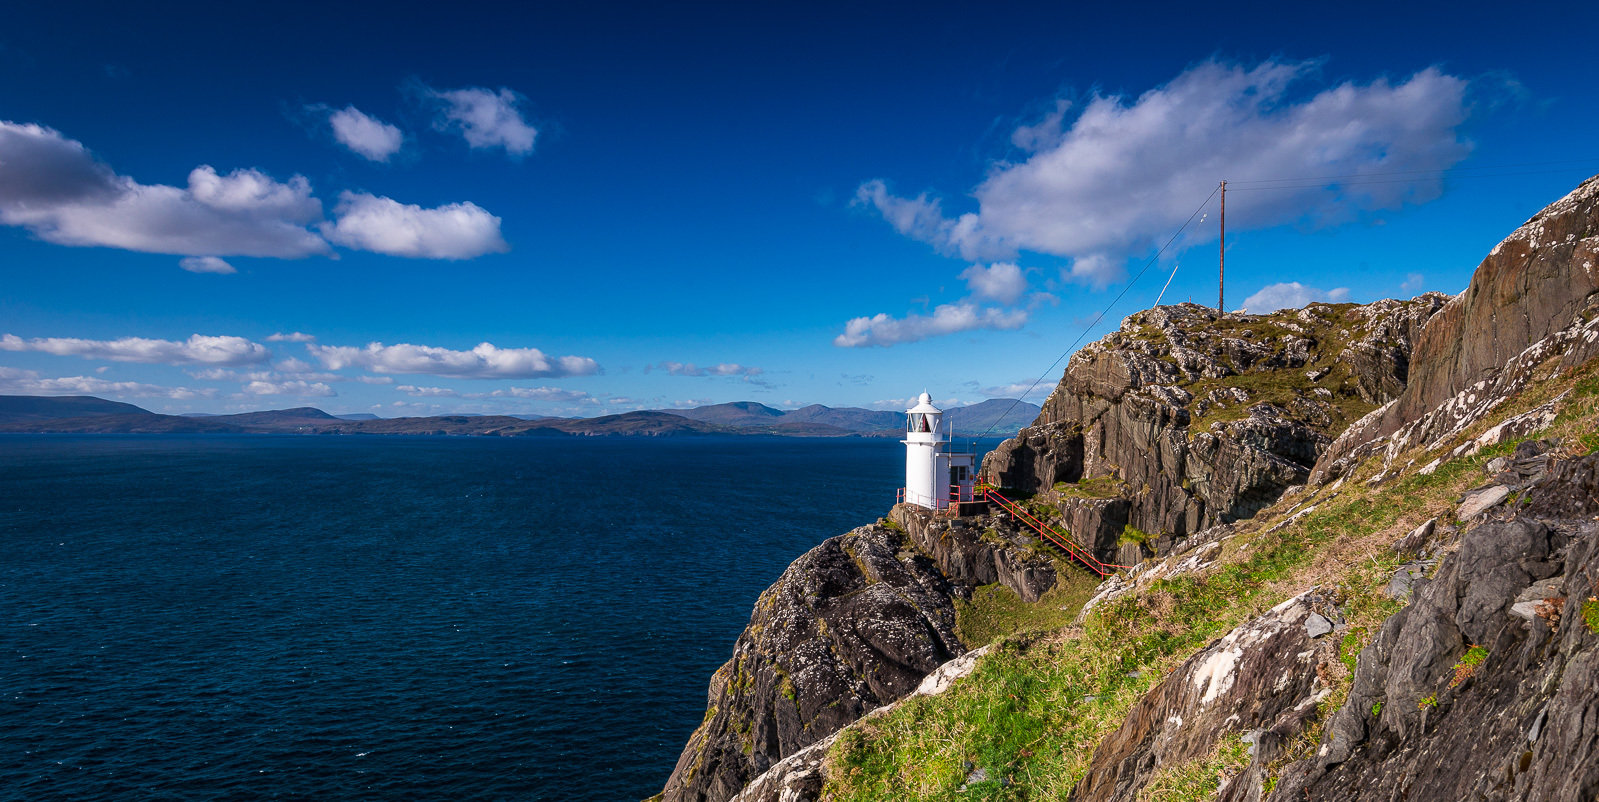 Sheep's Head Lighthouse, West Cork, Ireland. Sheep's Head Lighthouse - 1.